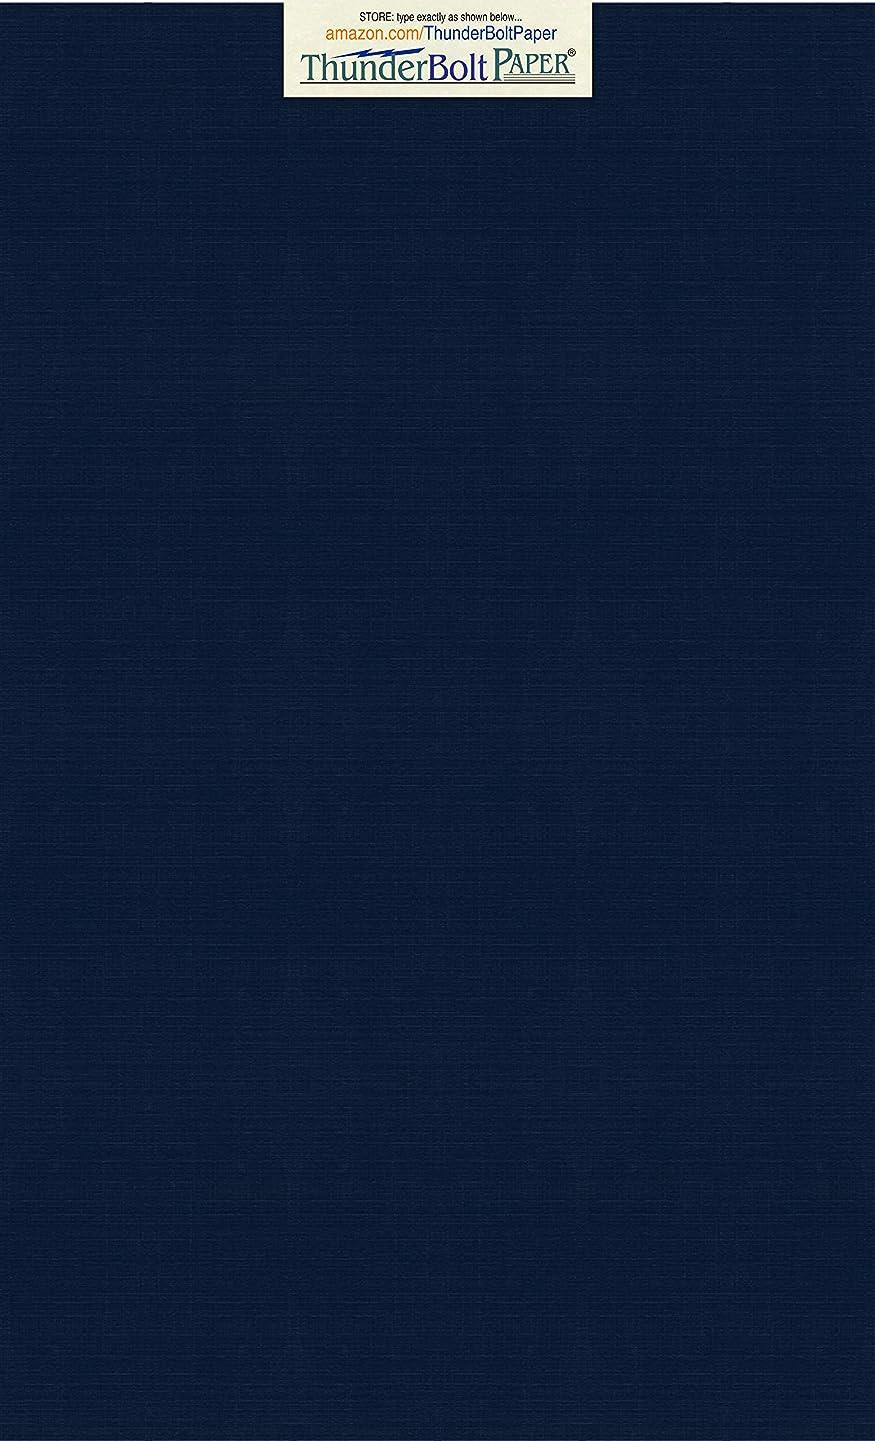 25 Dark Navy Blue Linen 80# Cover Paper Sheets - 8.5